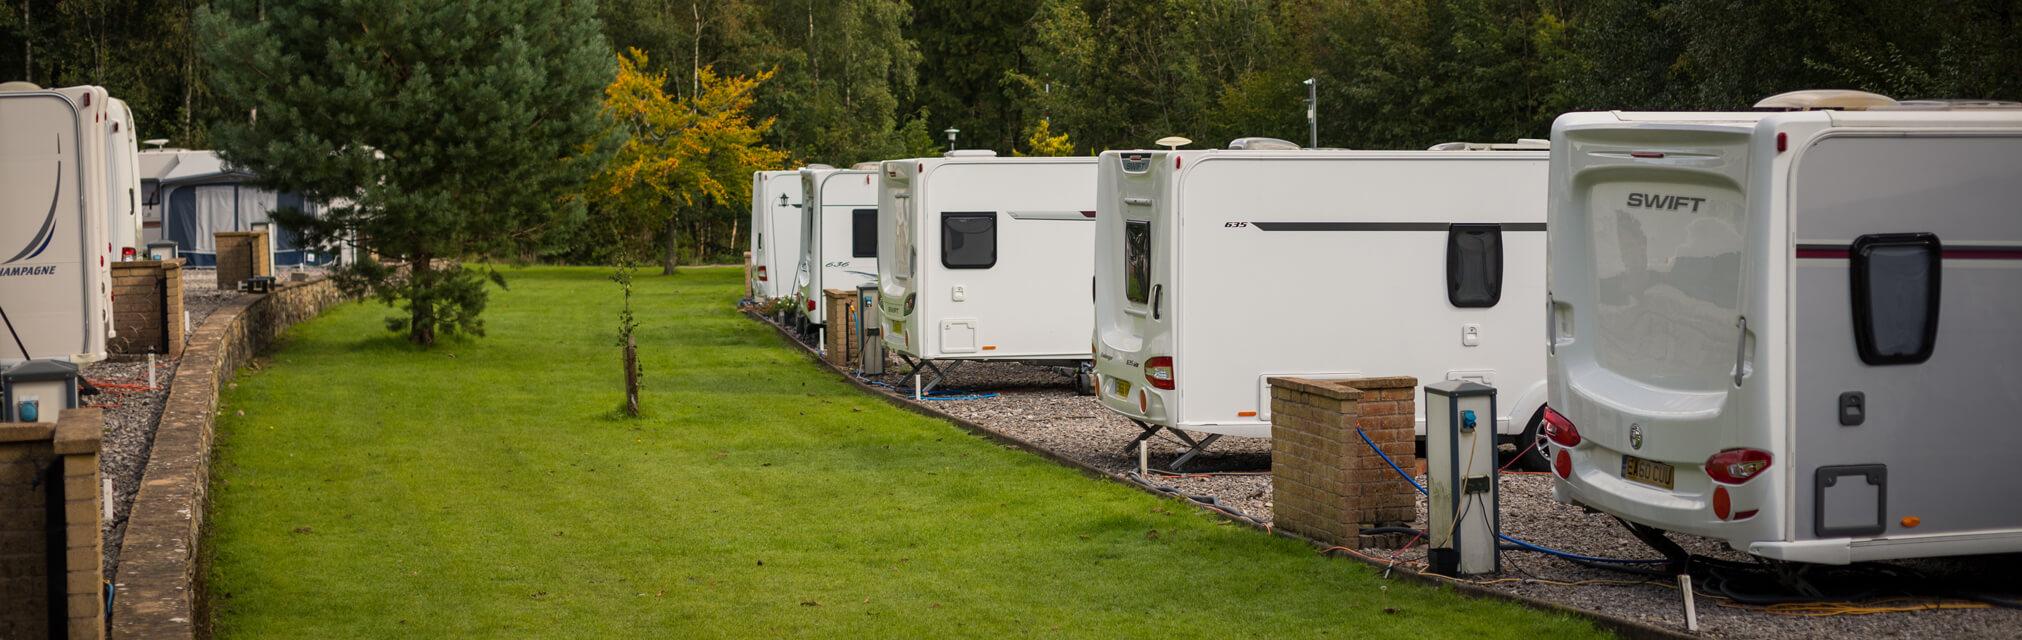 Our Touring Caravan Site in Lancashire